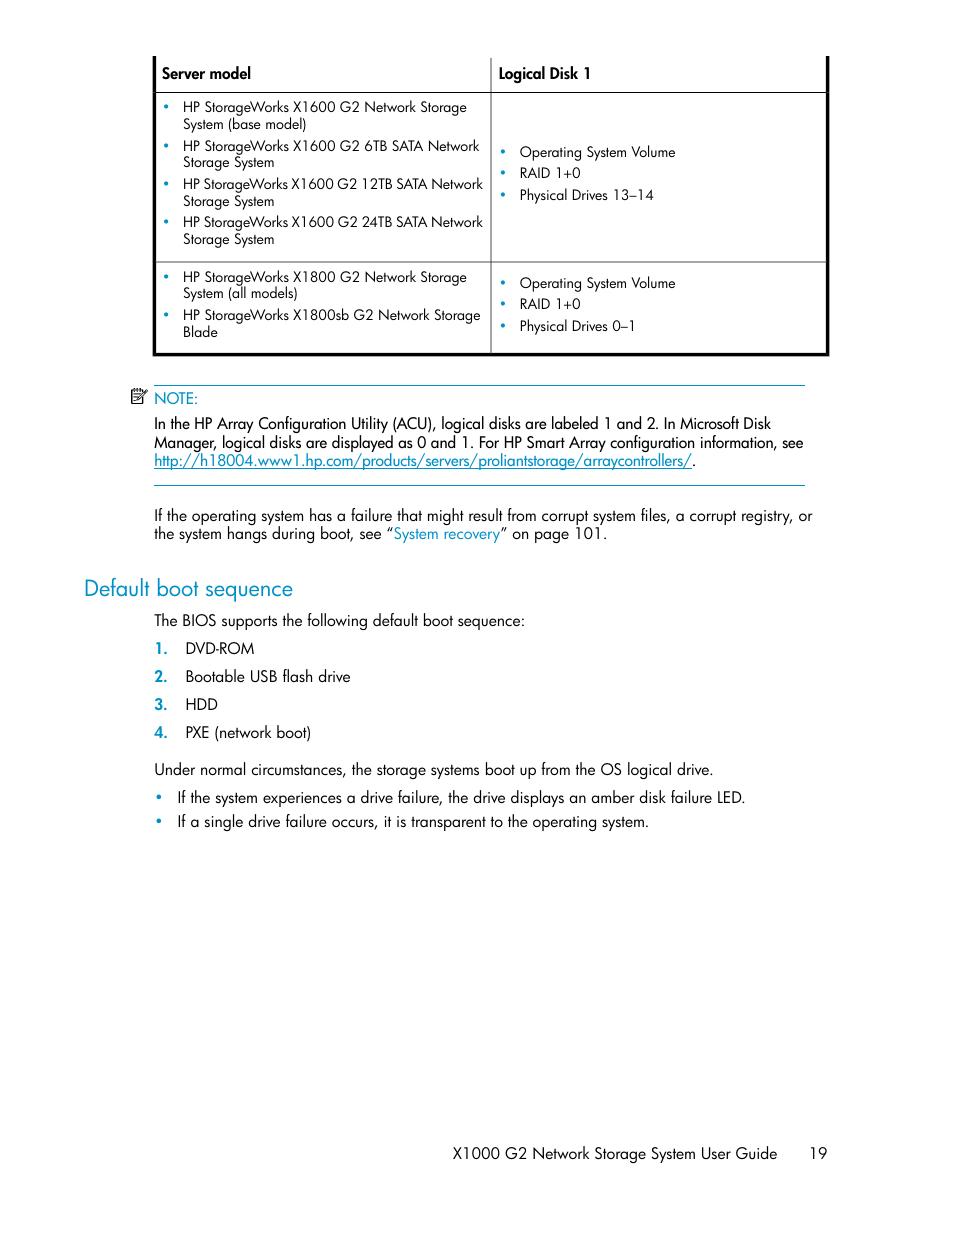 Default boot sequence | HP StoreEasy 1000 Storage User